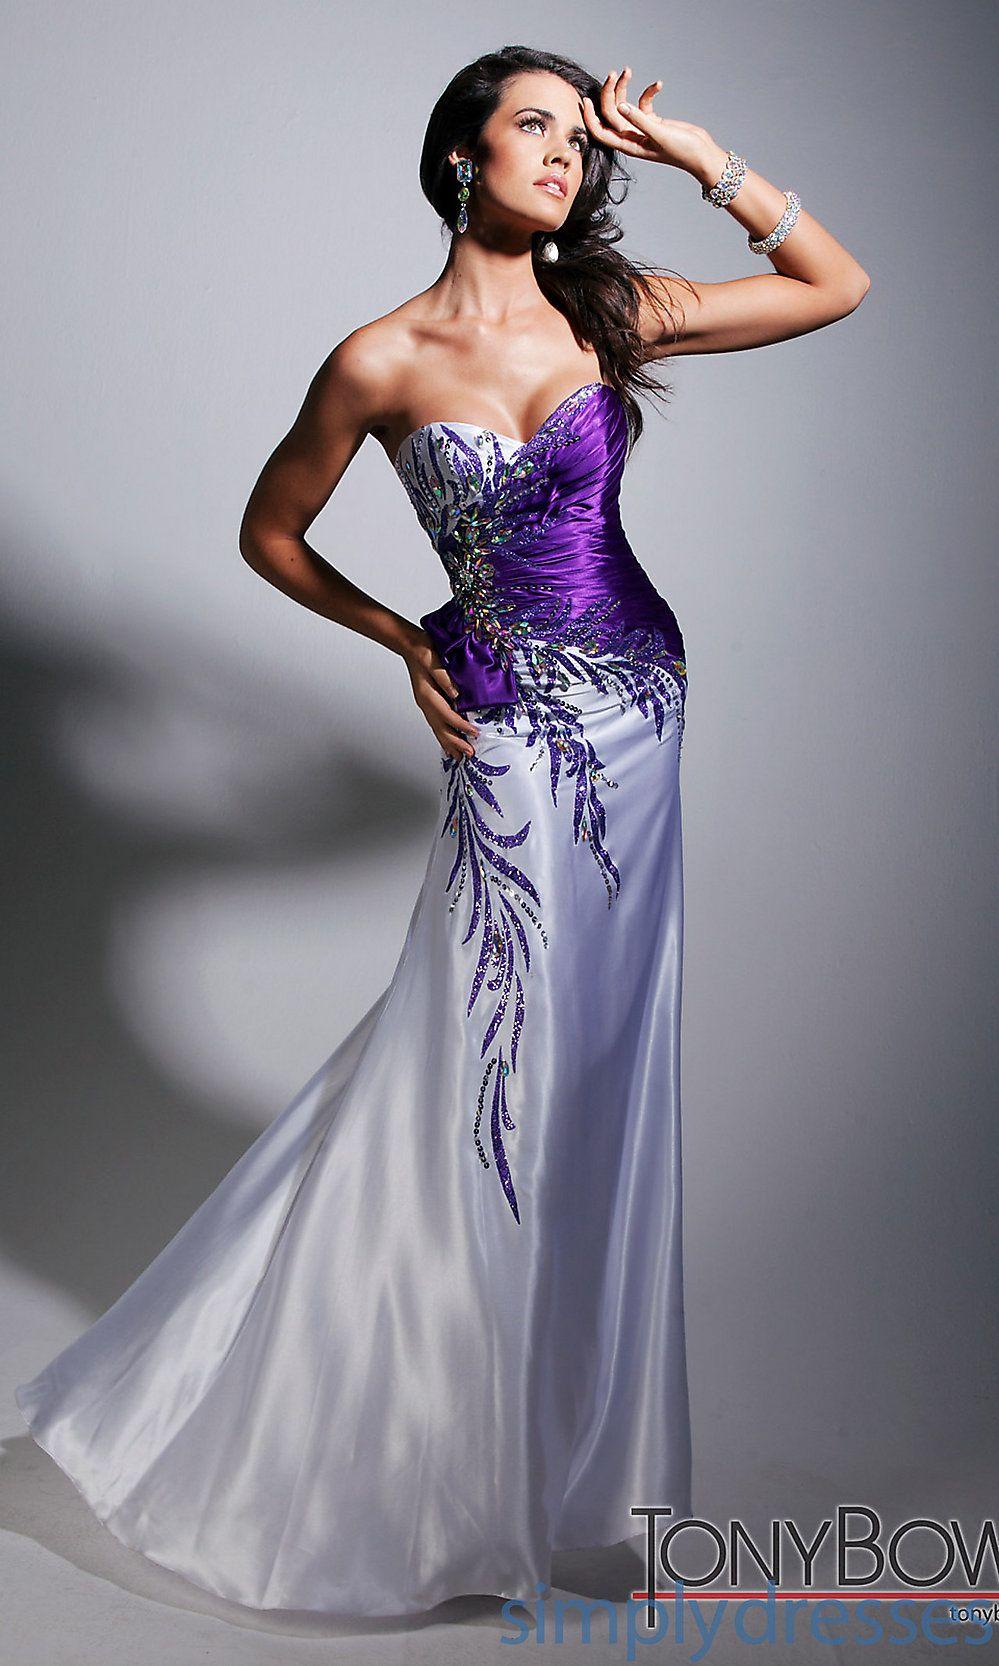 Mardi Gras Ball Dress